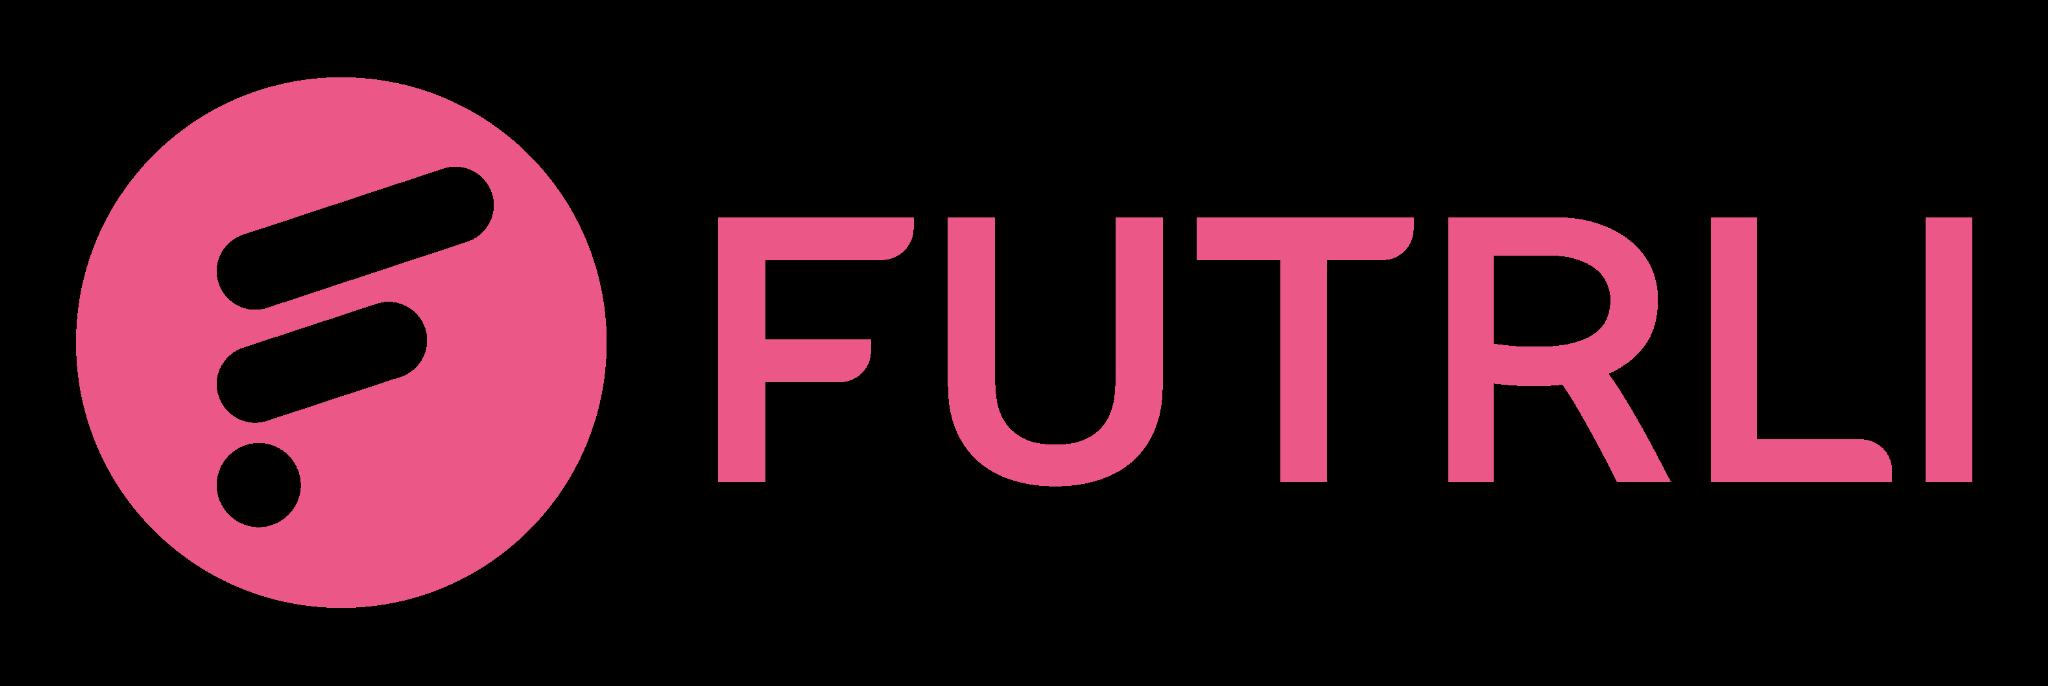 Futrli_logo.png